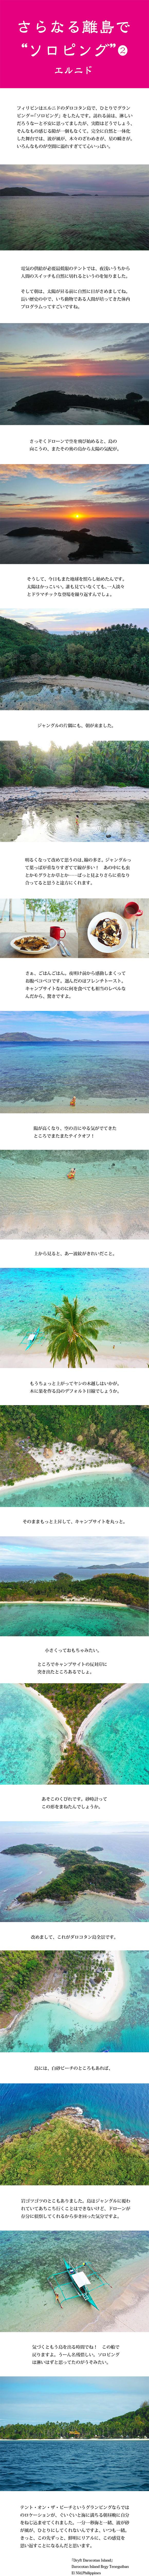 tomako190508.jpg